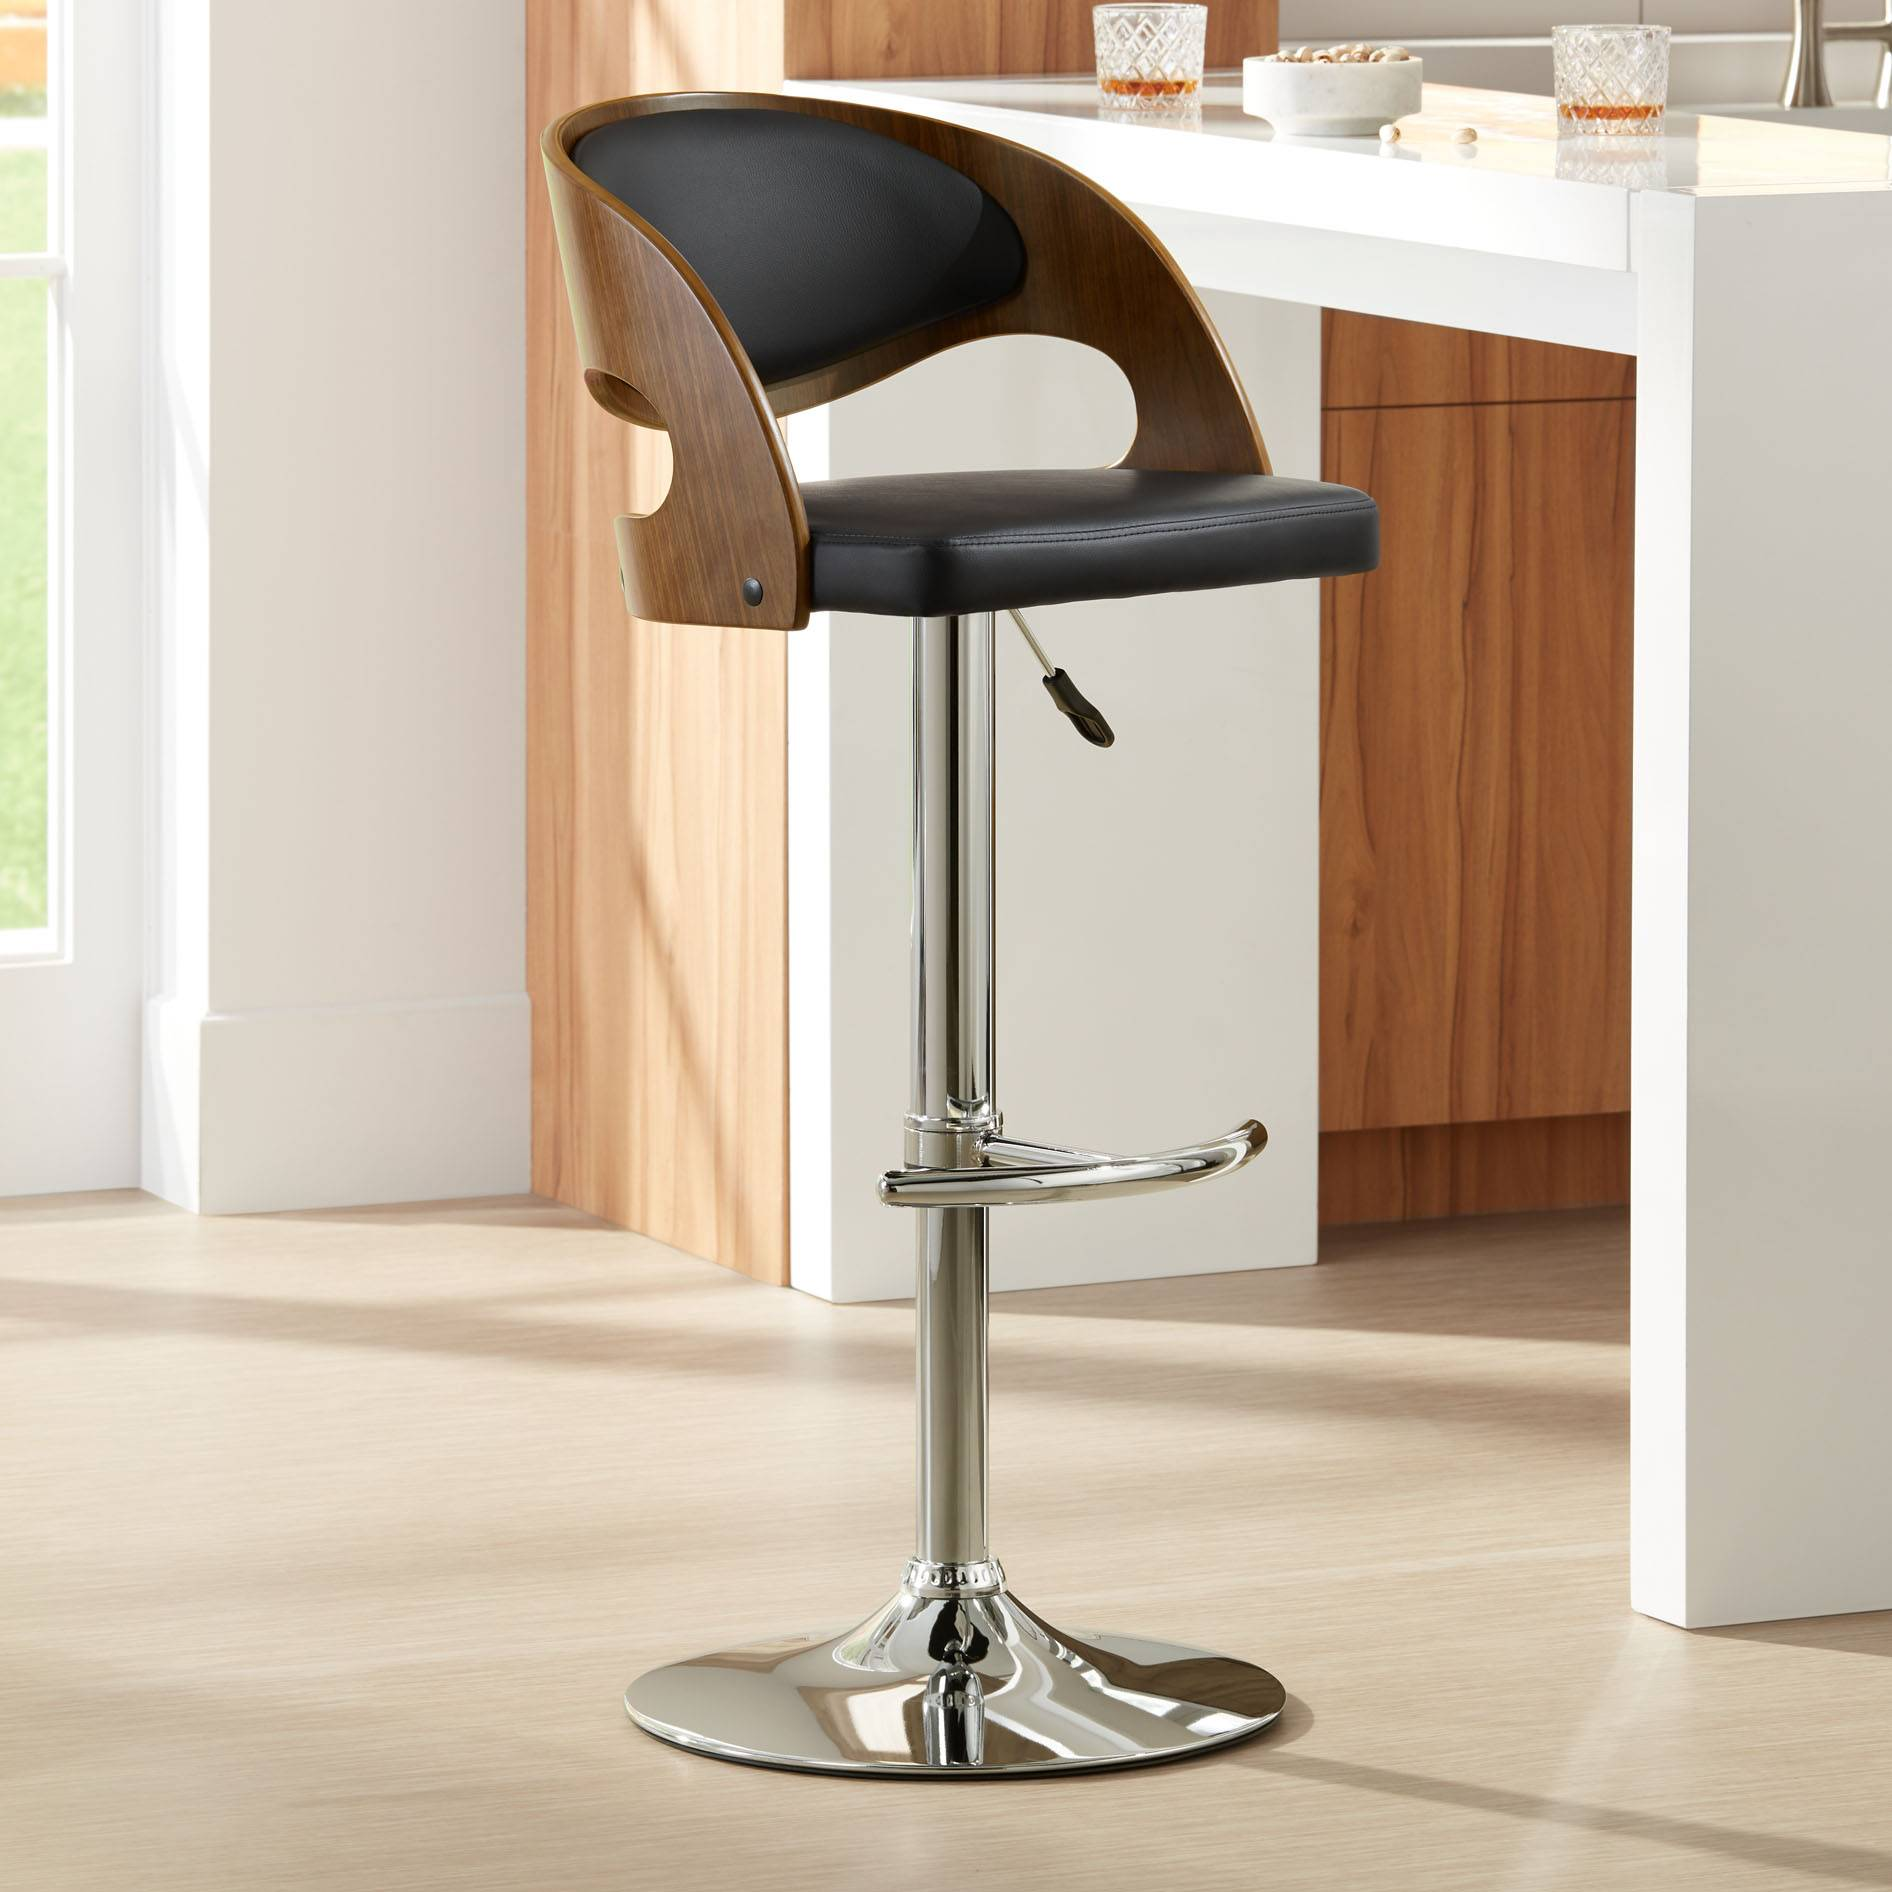 Astonishing Details About Malibu Black Faux Leather Adjustable Swivel Bar Stool Lamtechconsult Wood Chair Design Ideas Lamtechconsultcom